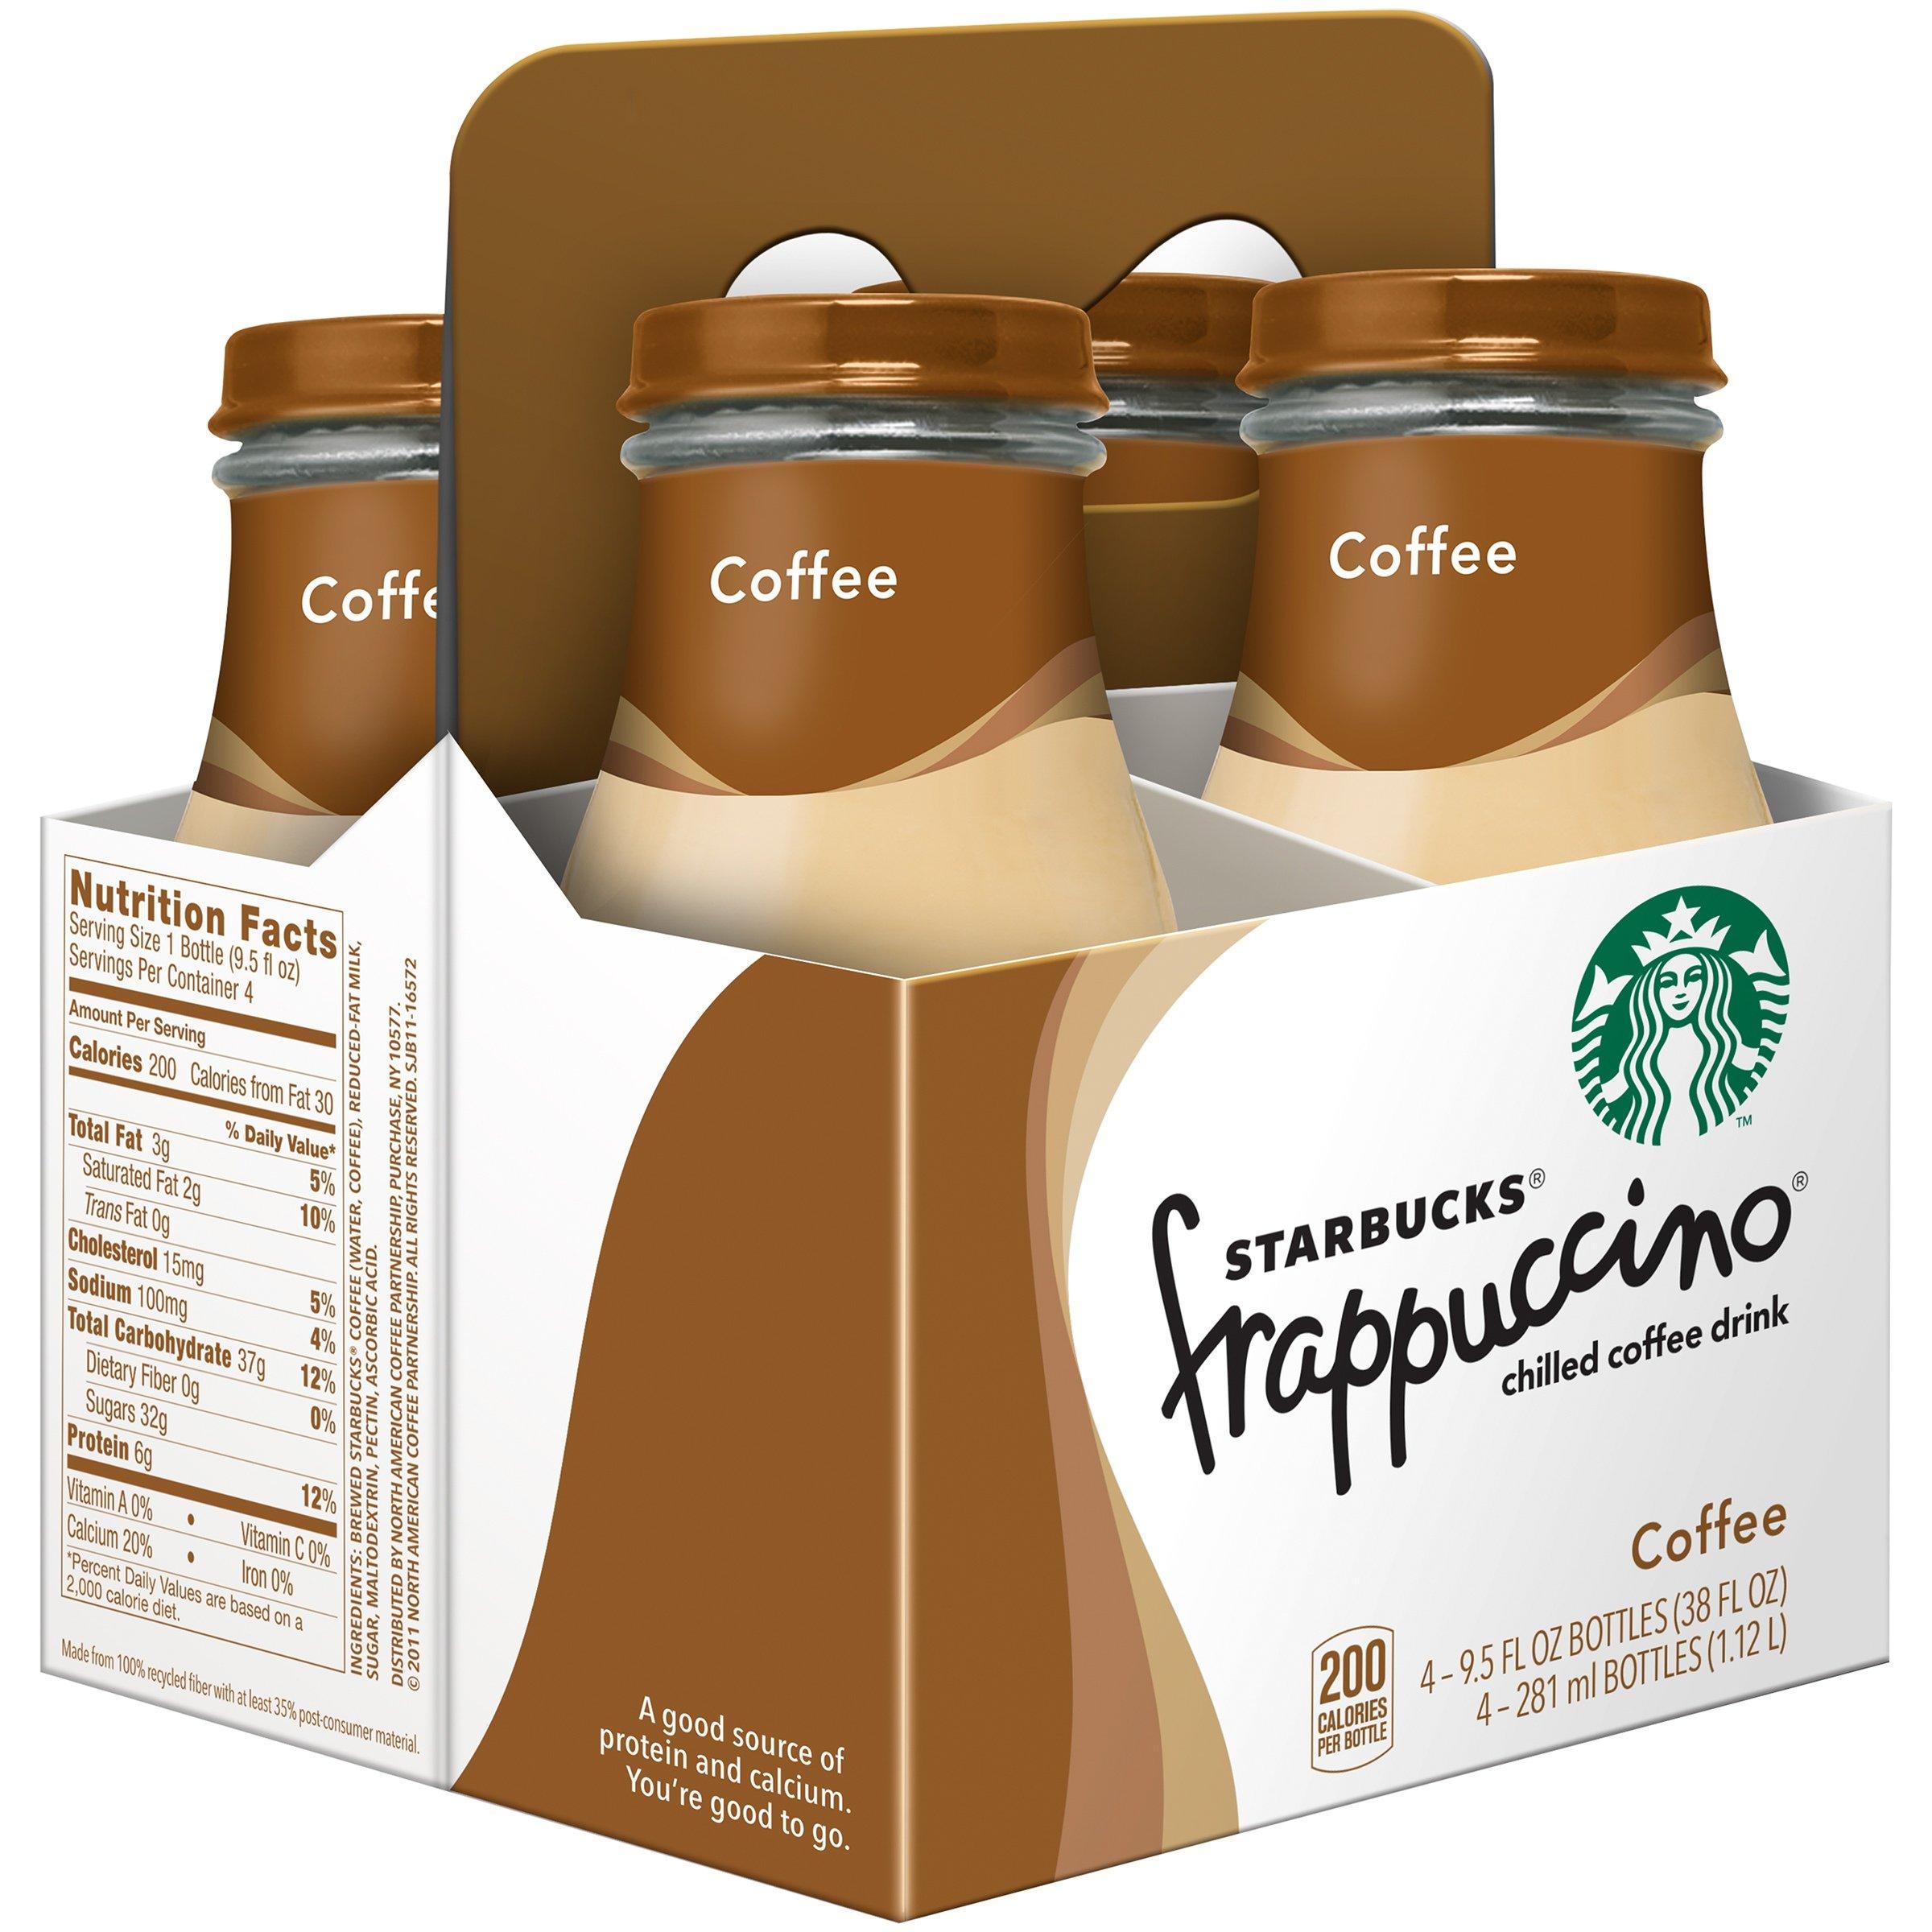 Starbucks Coffee Frappuccino Variety Pack! Mocha Light, Coffee, Chilled Mocha, 9.5 oz Glass Bottles (Pack of 3, Total of 12 Glass Bottles) by Starbucks Coffee Frappuccino (Image #3)